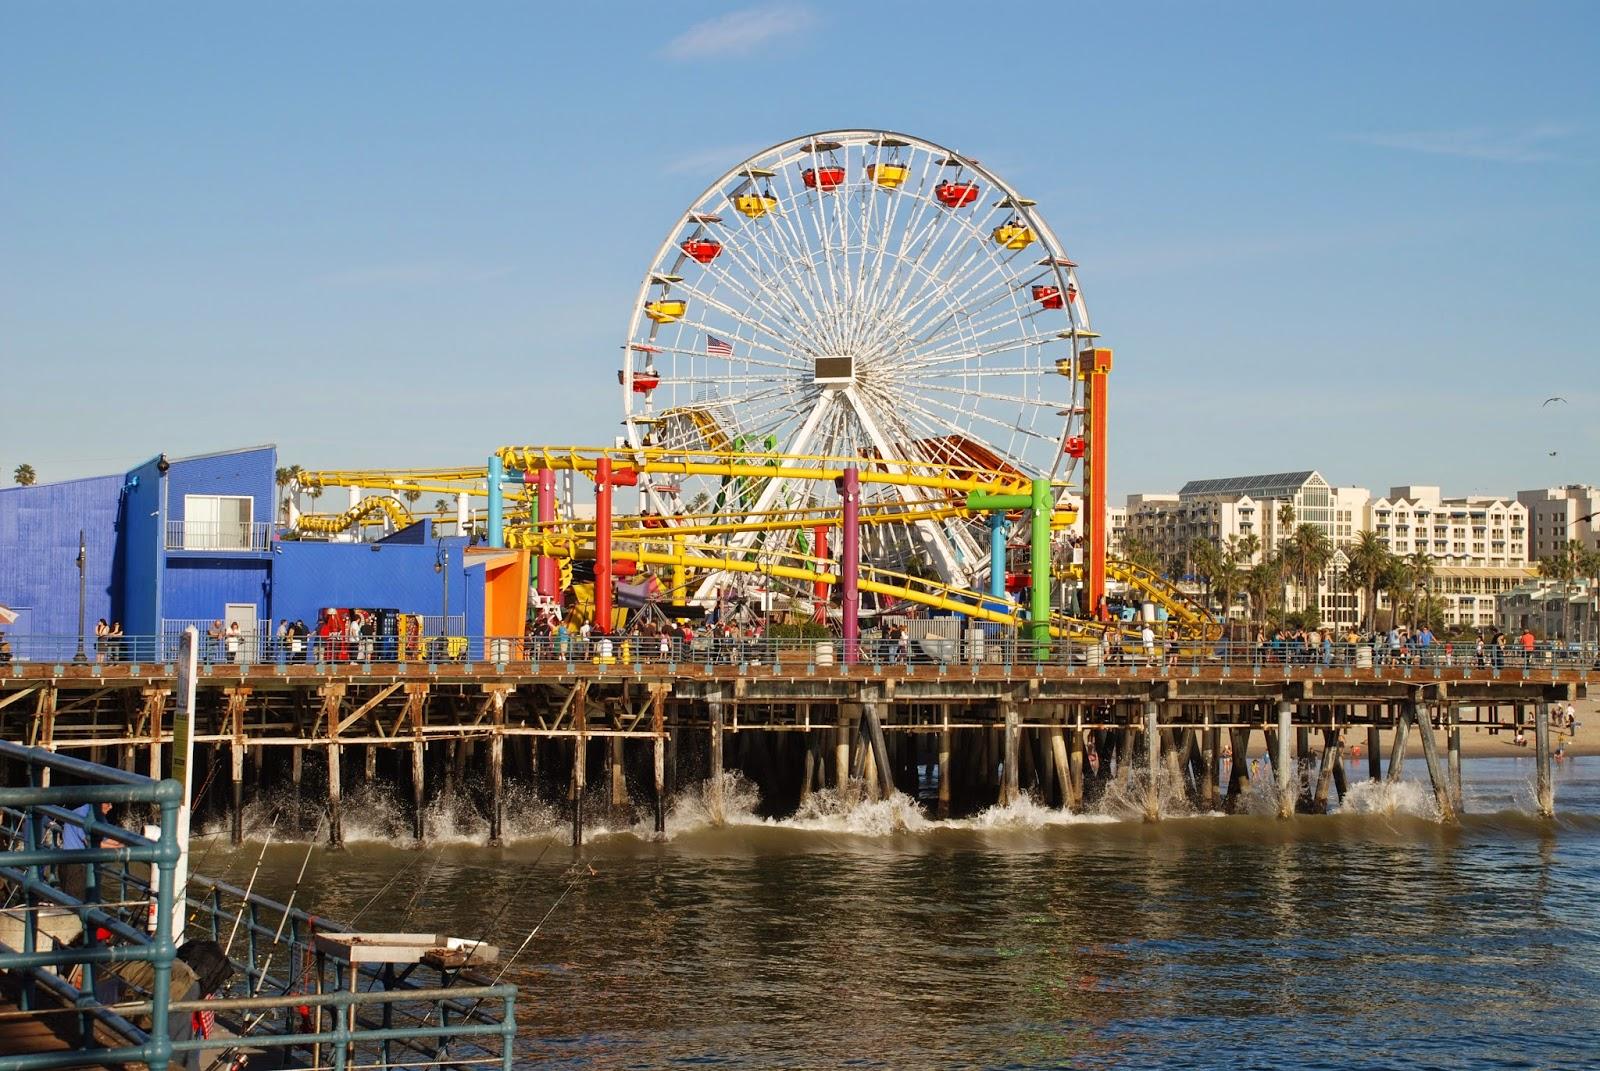 Pacific Park em Santa Monica, Los Angeles, na Califórnia